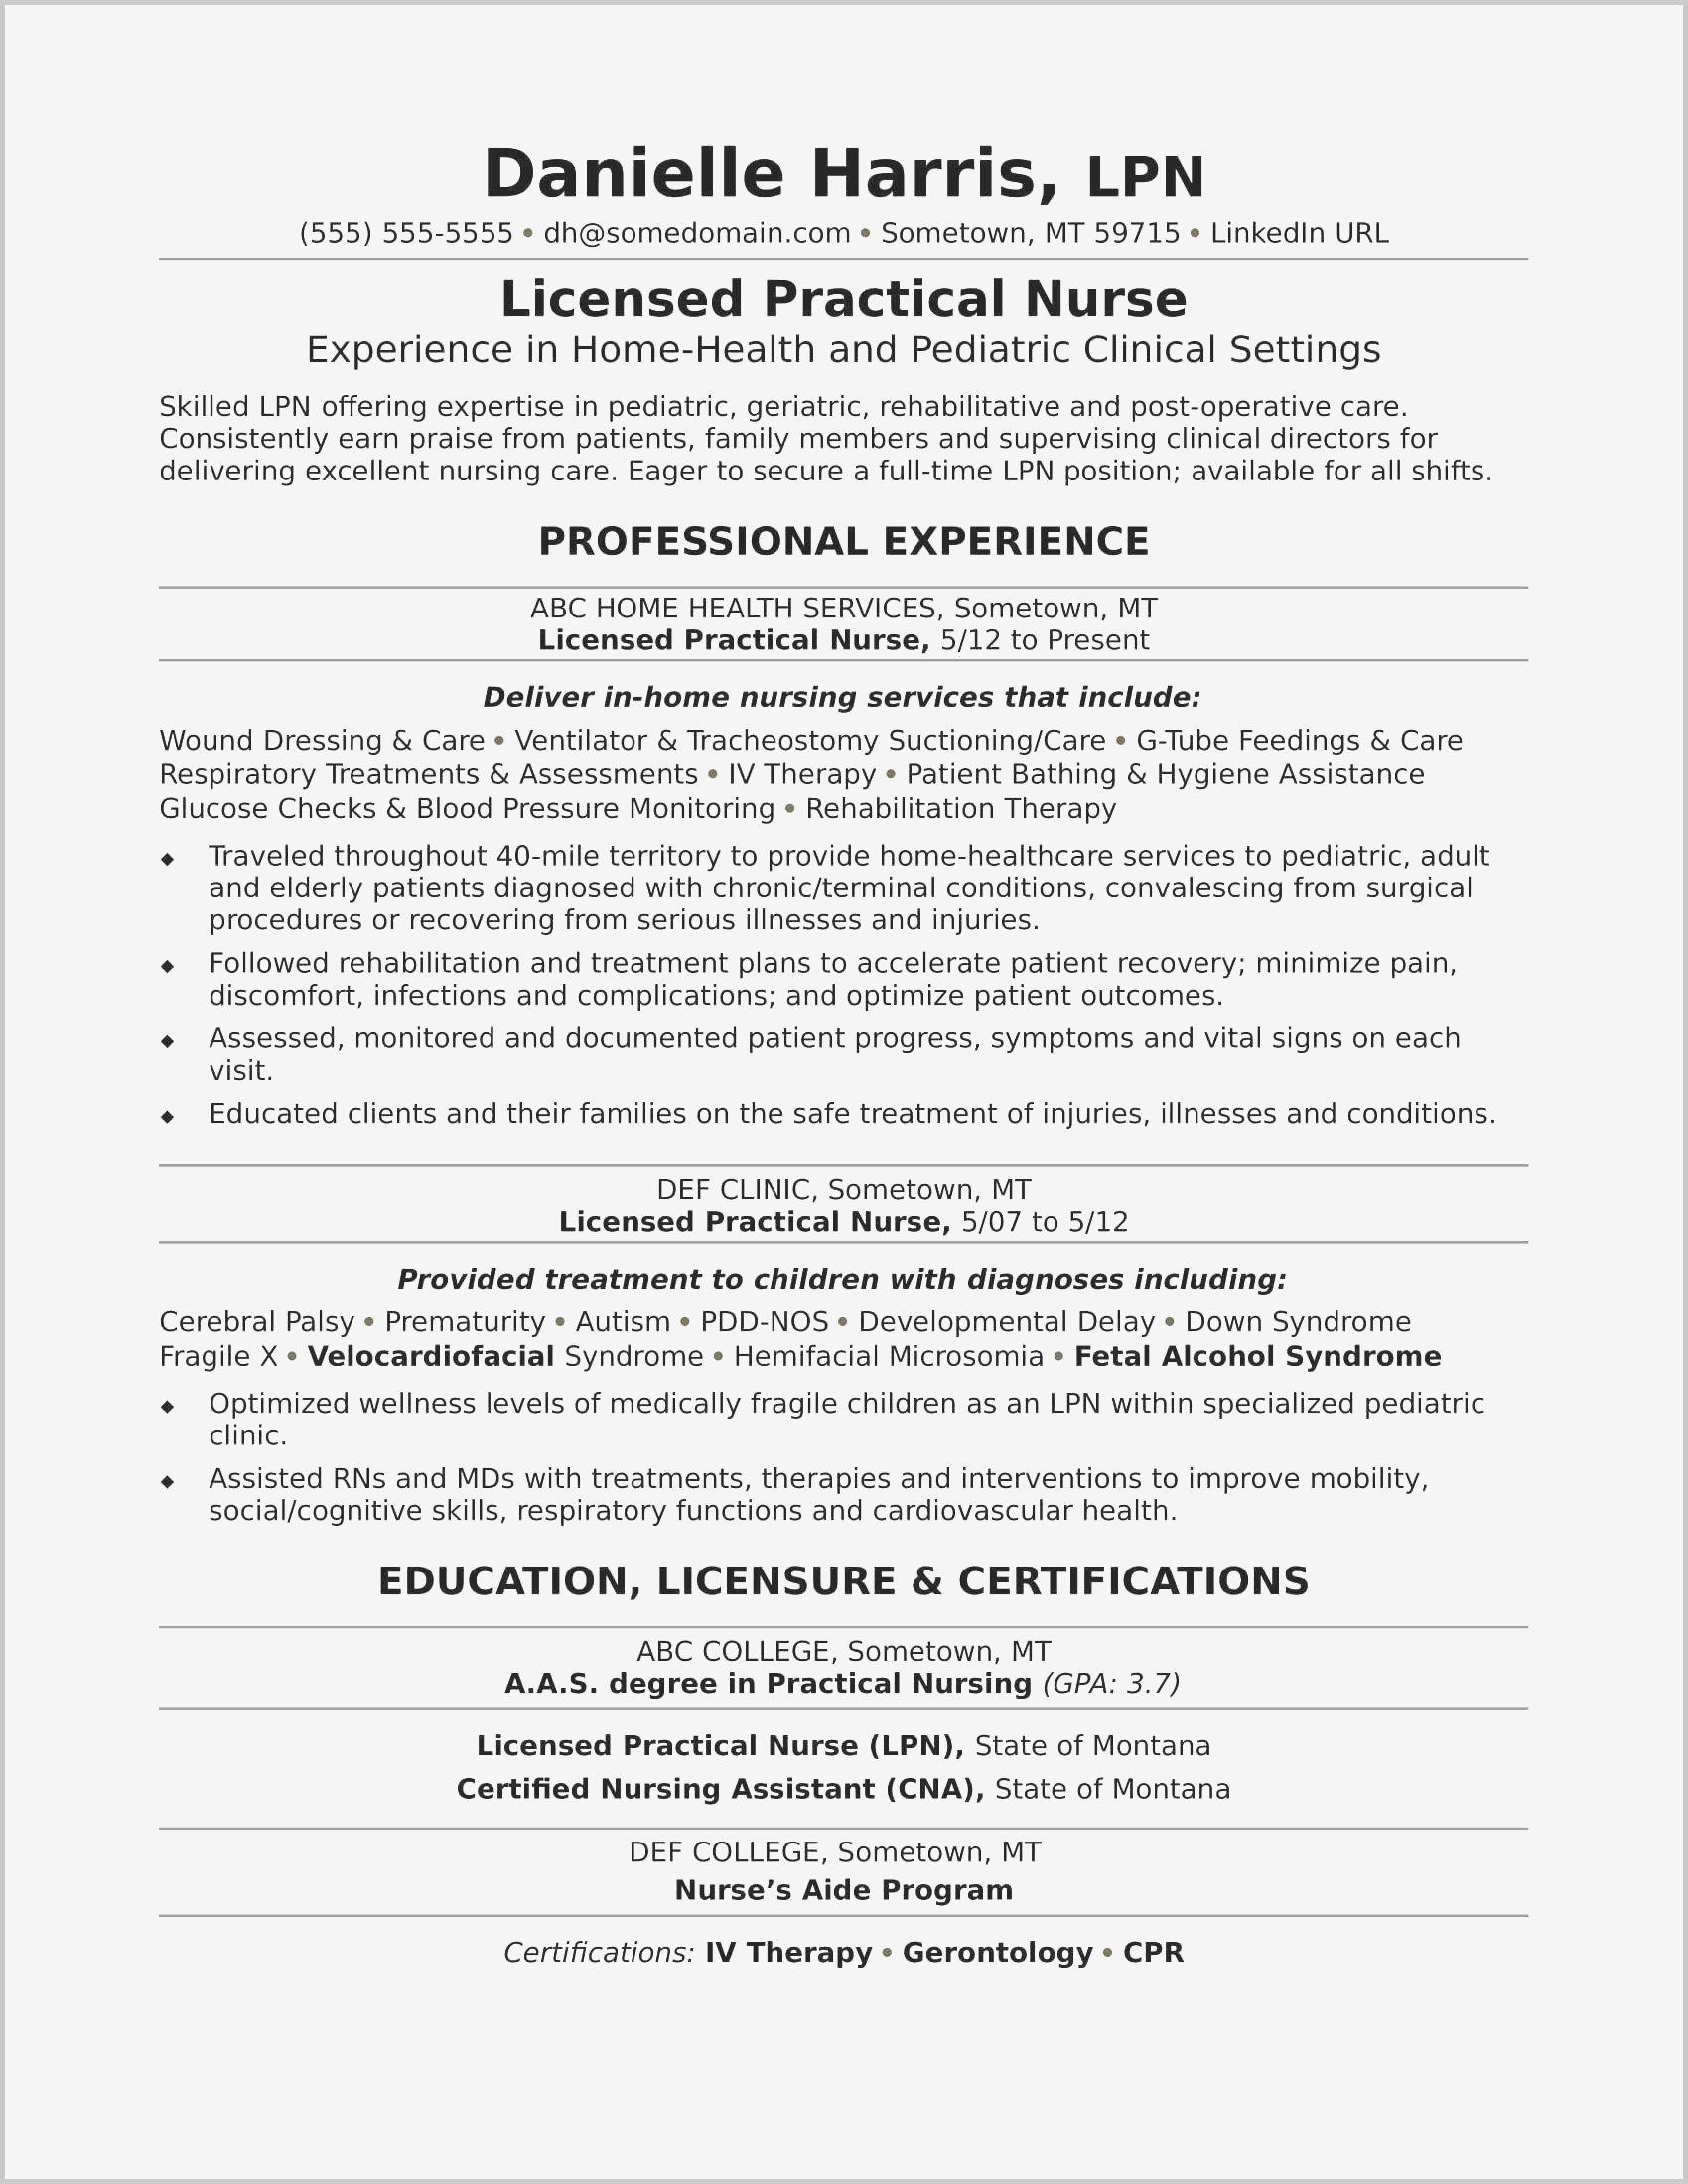 Physical Therapist Assistant Resume Elegant Occupational Therapist Assistant Resume Sample Kizi In 2020 Registered Nurse Resume Nursing Resume Basic Resume Examples